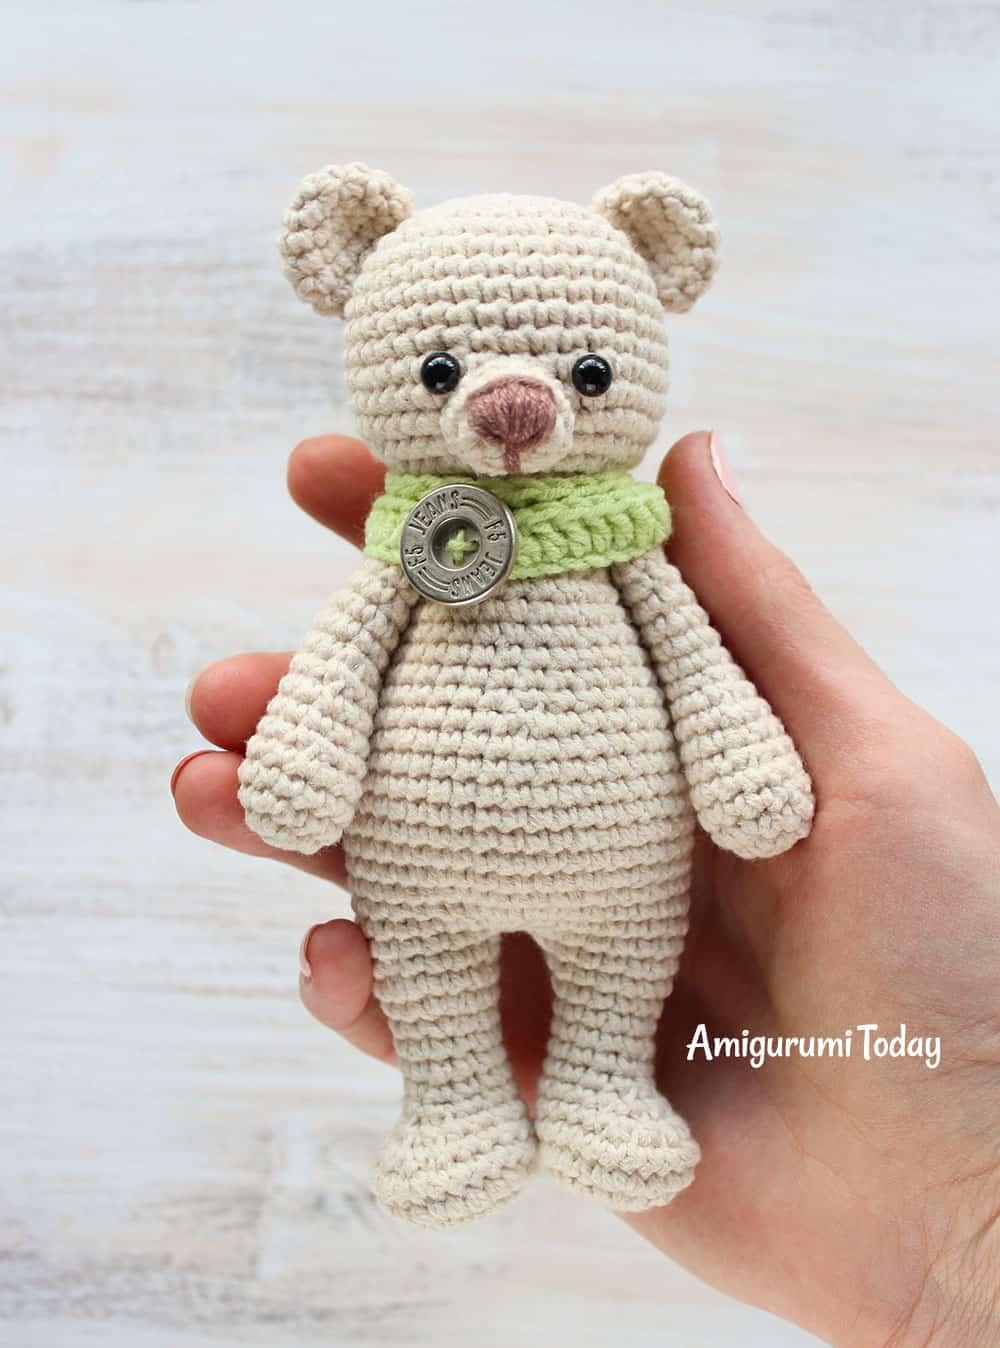 cuddle-me-bear-amigurumi